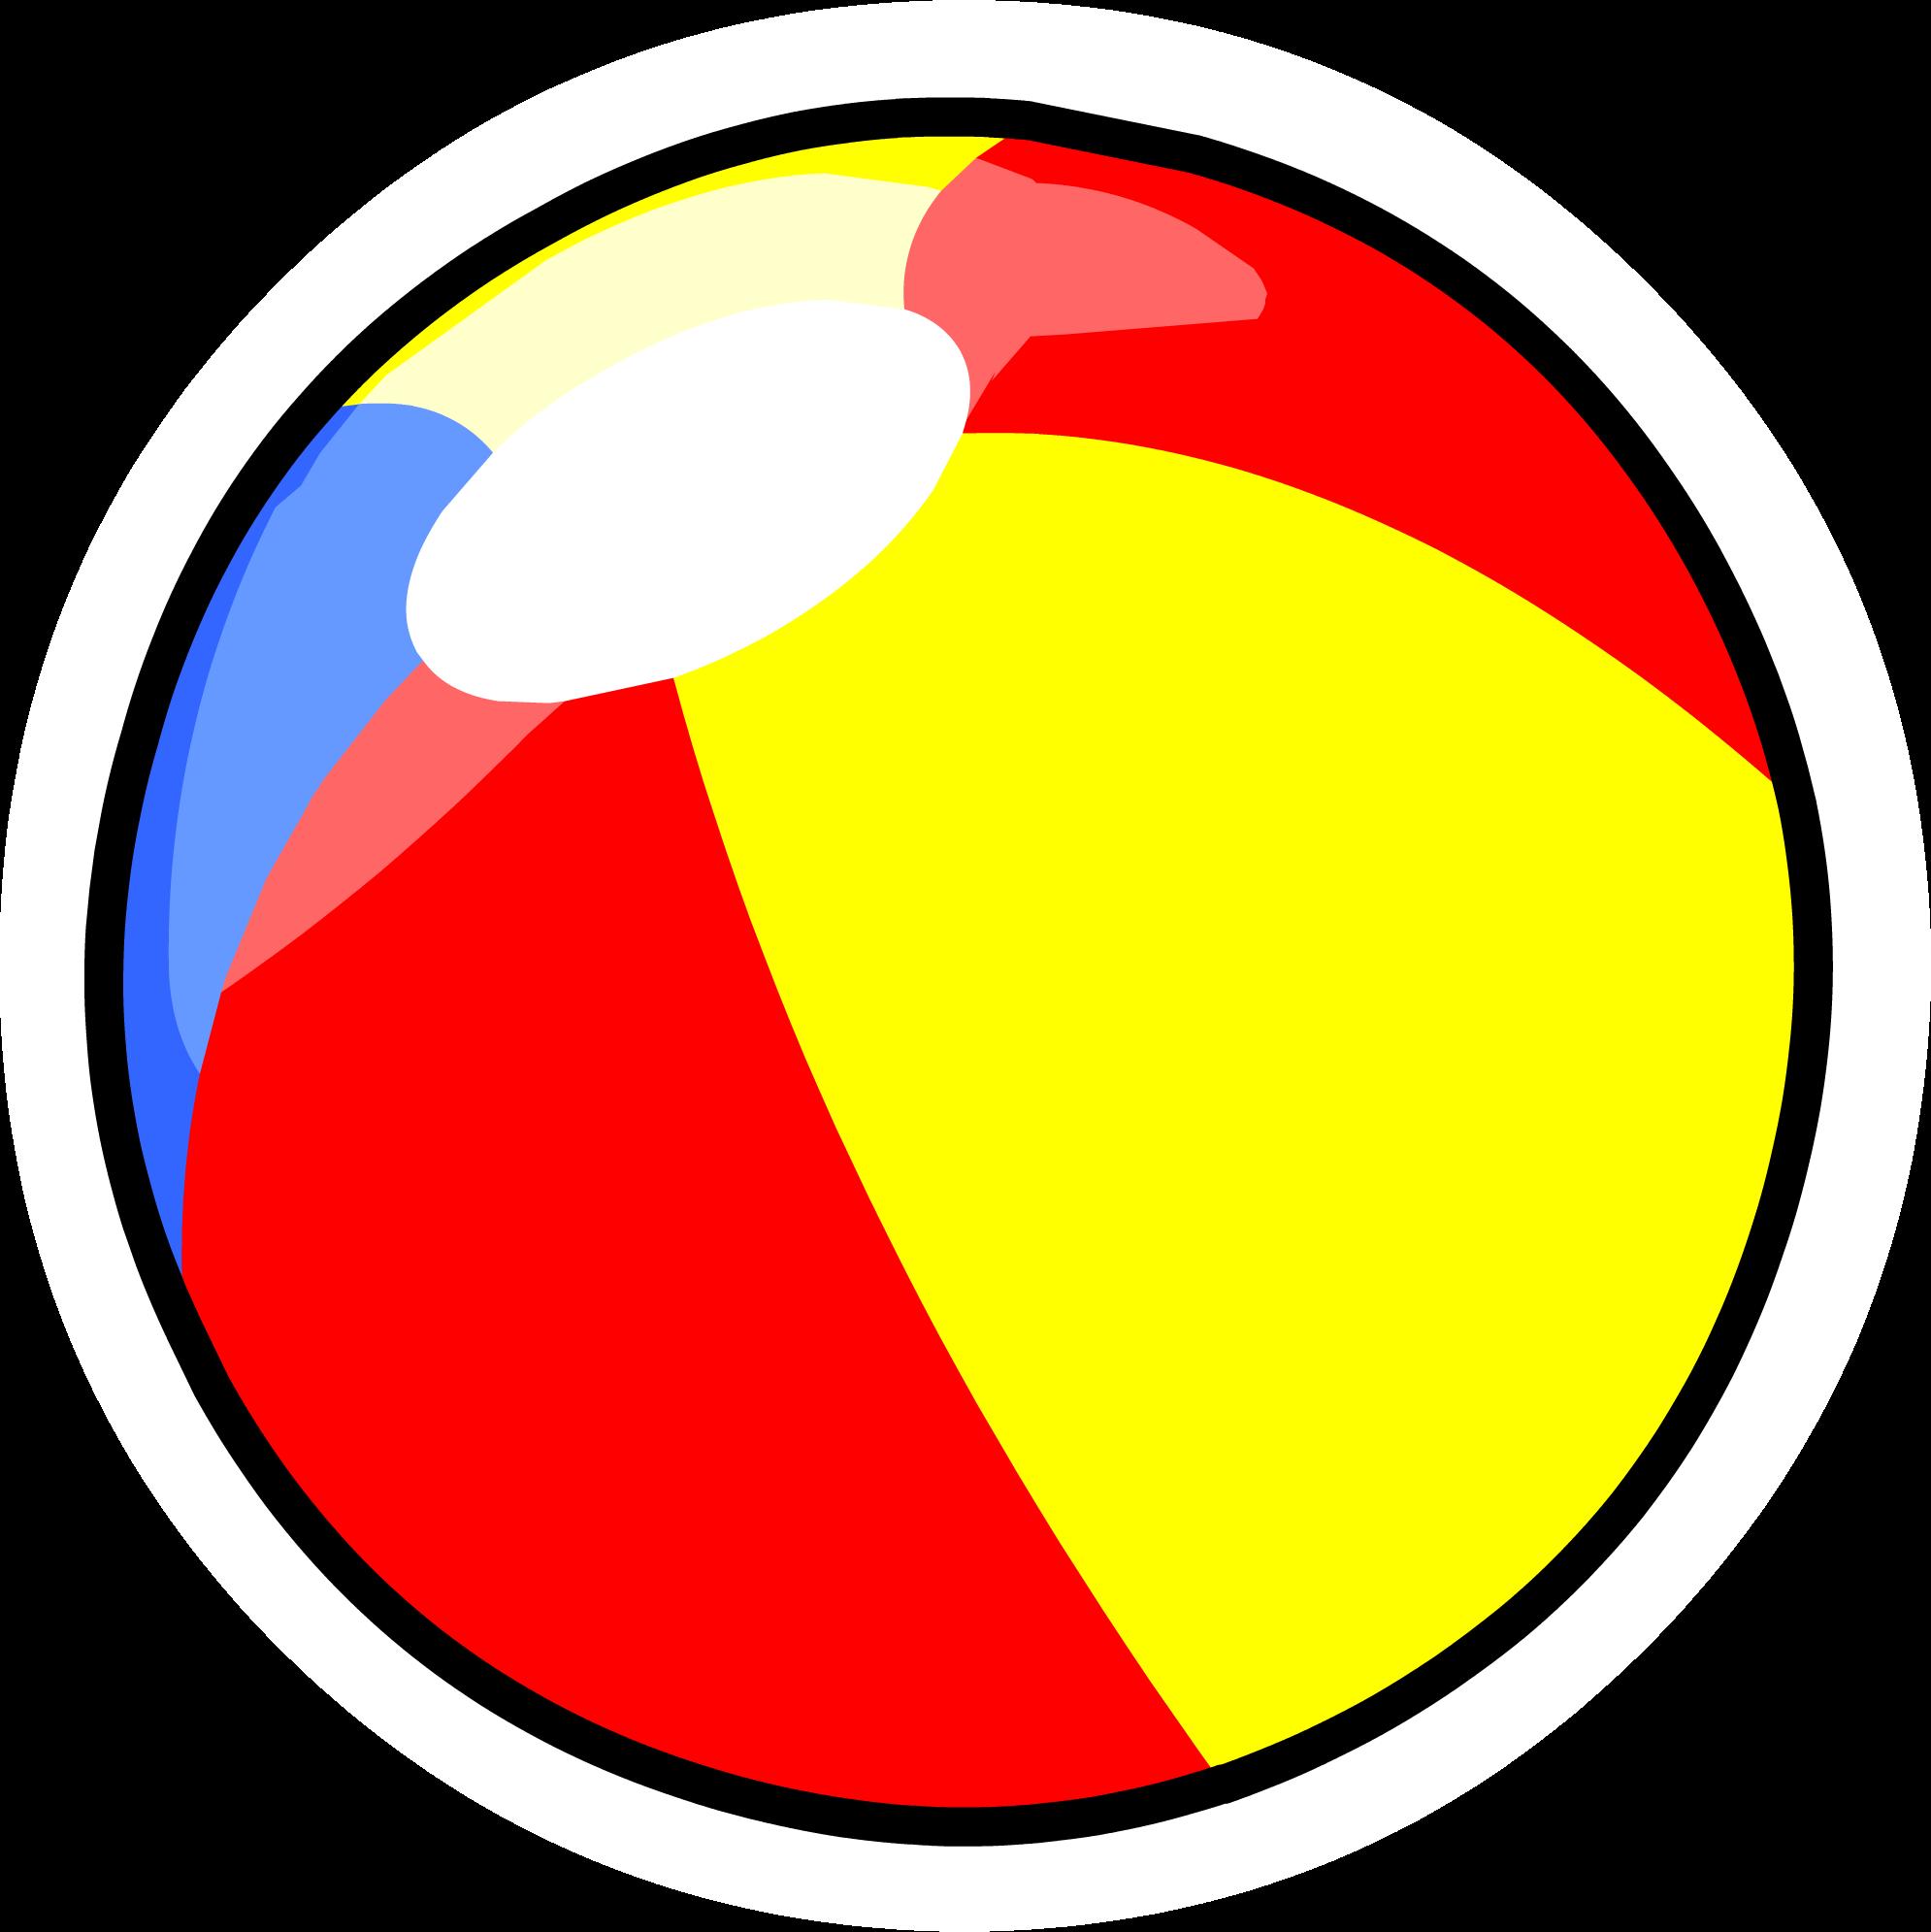 Clipart sun beach ball graphic royalty free Beach Ball pin | Club Penguin Wiki | FANDOM powered by Wikia graphic royalty free